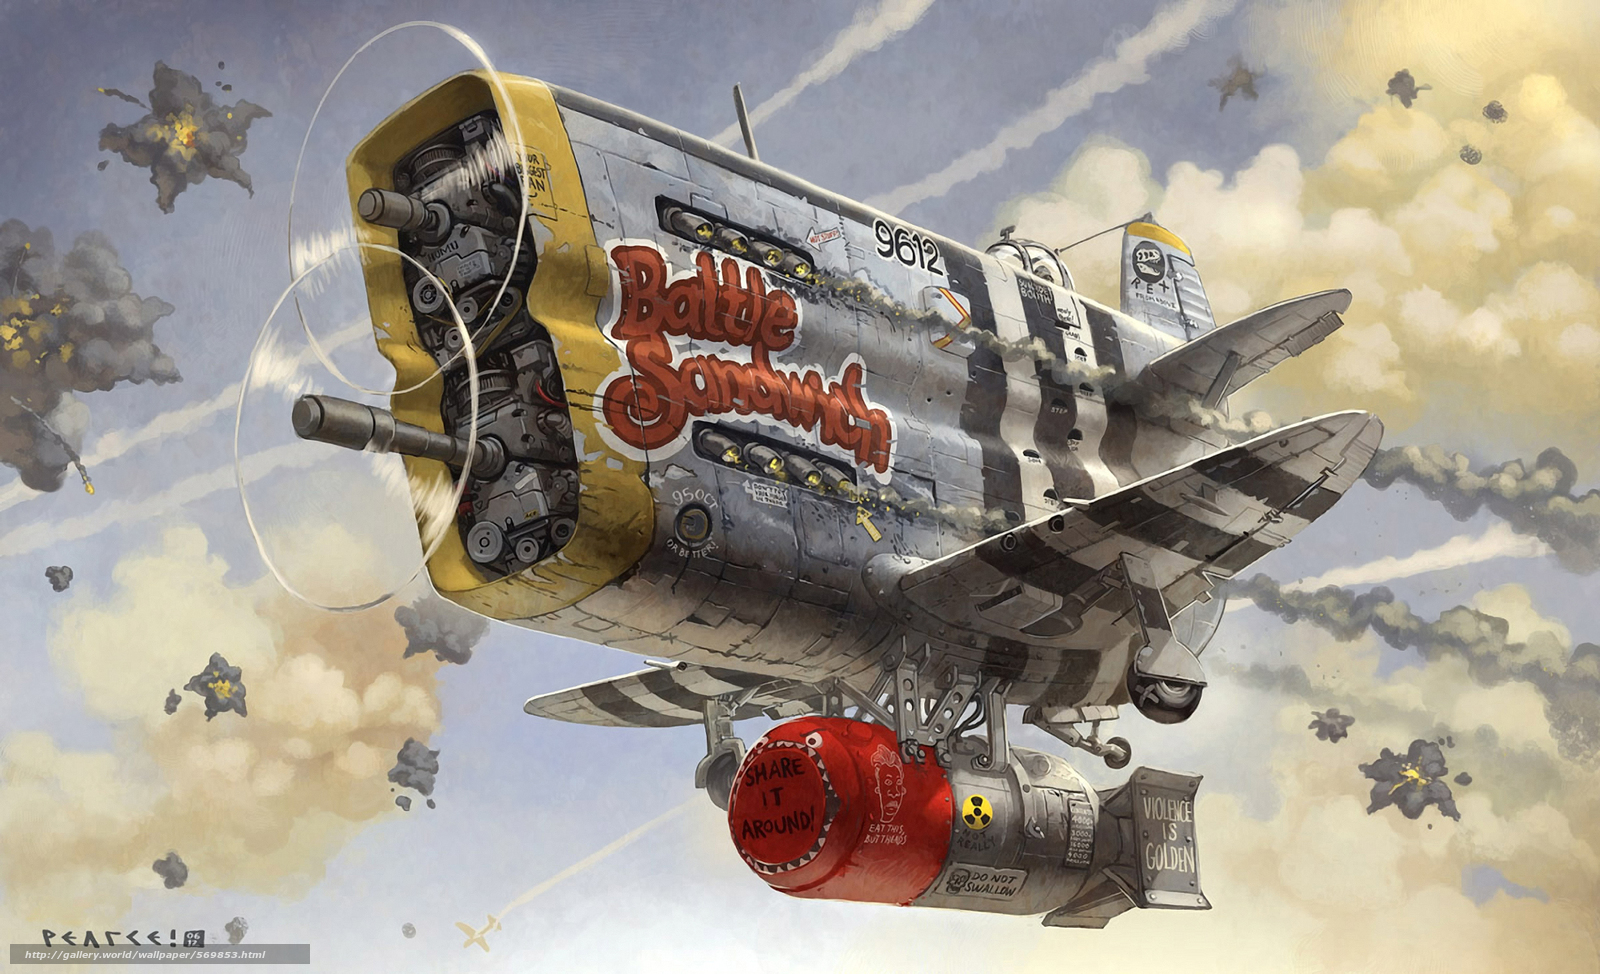 Tlcharger fond d 39 ecran combat acharn bombe nucl aire for Bureau grotesque